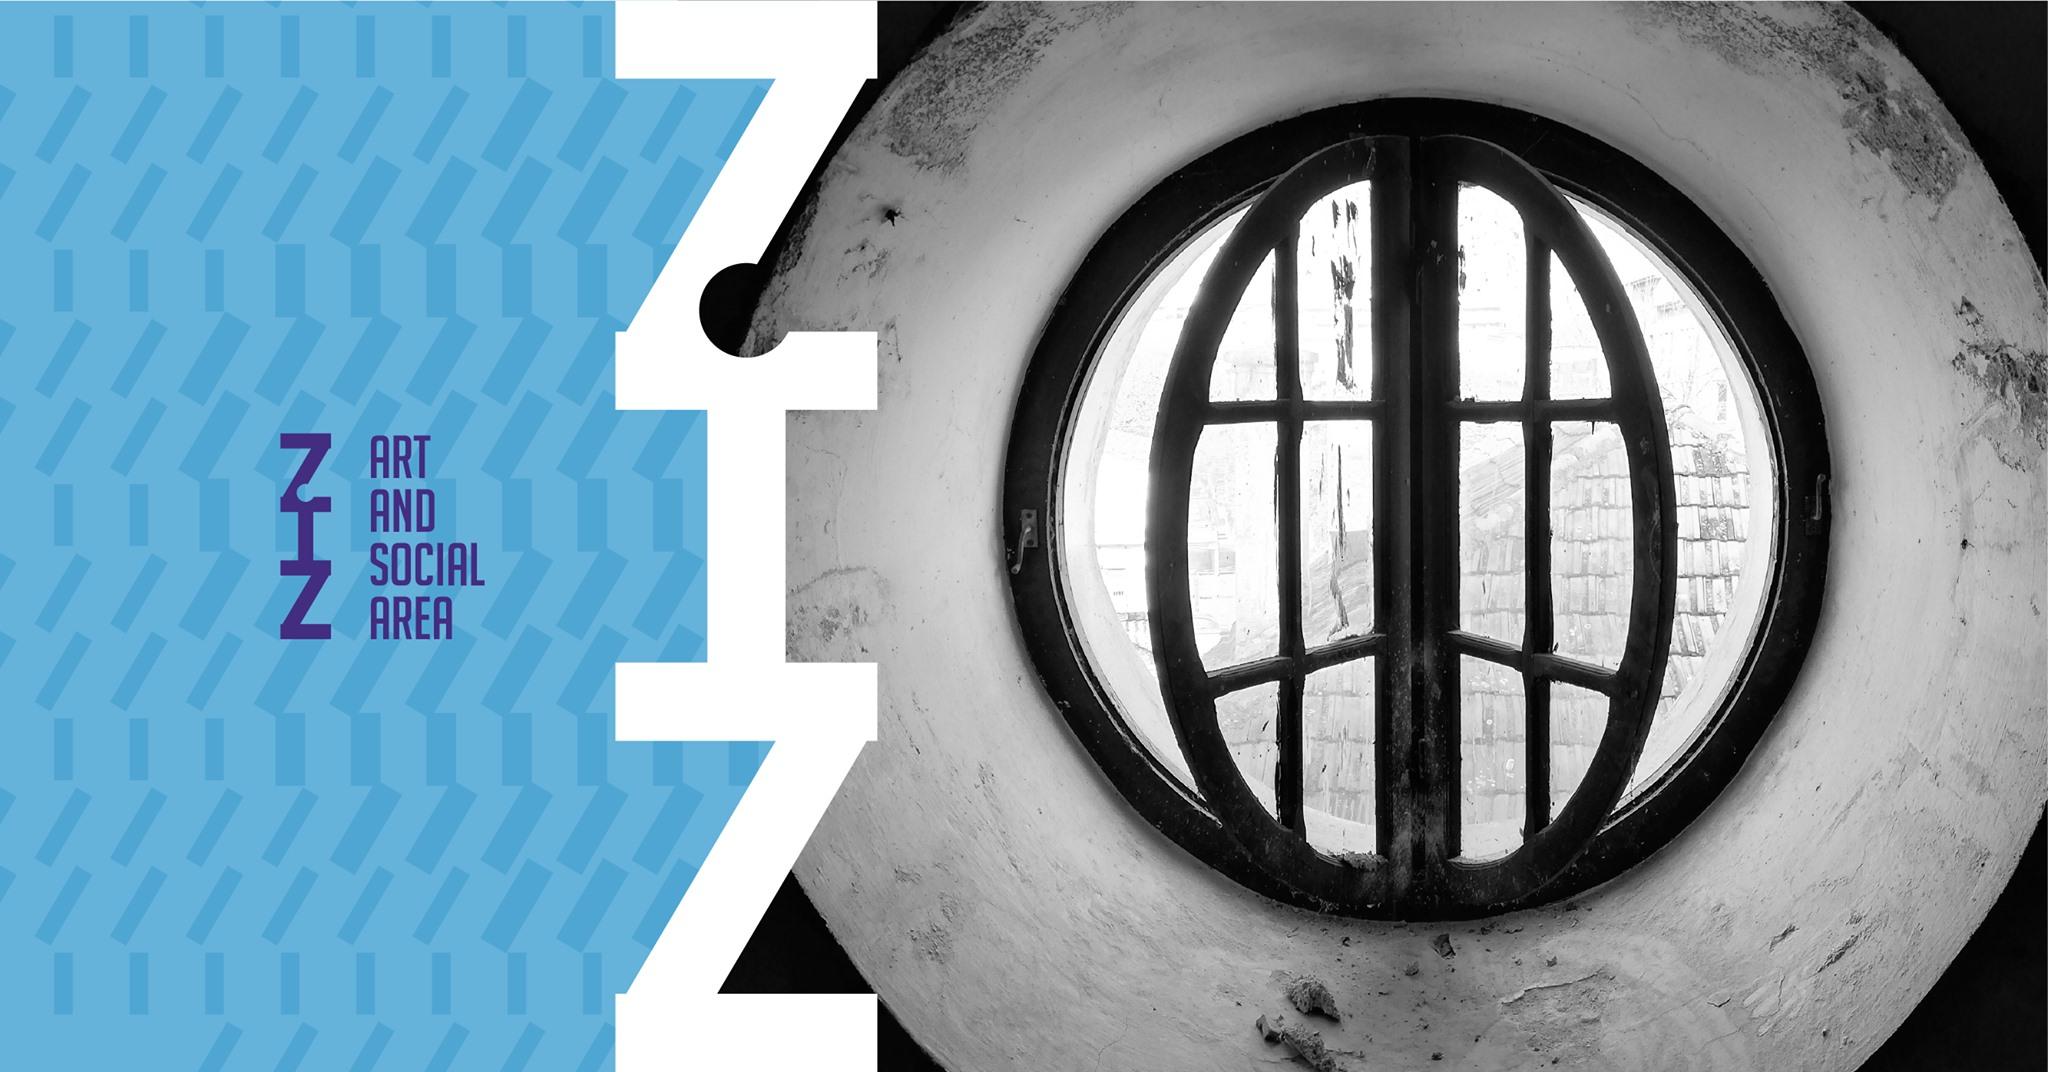 ZIZ: Art and Social Area Opening